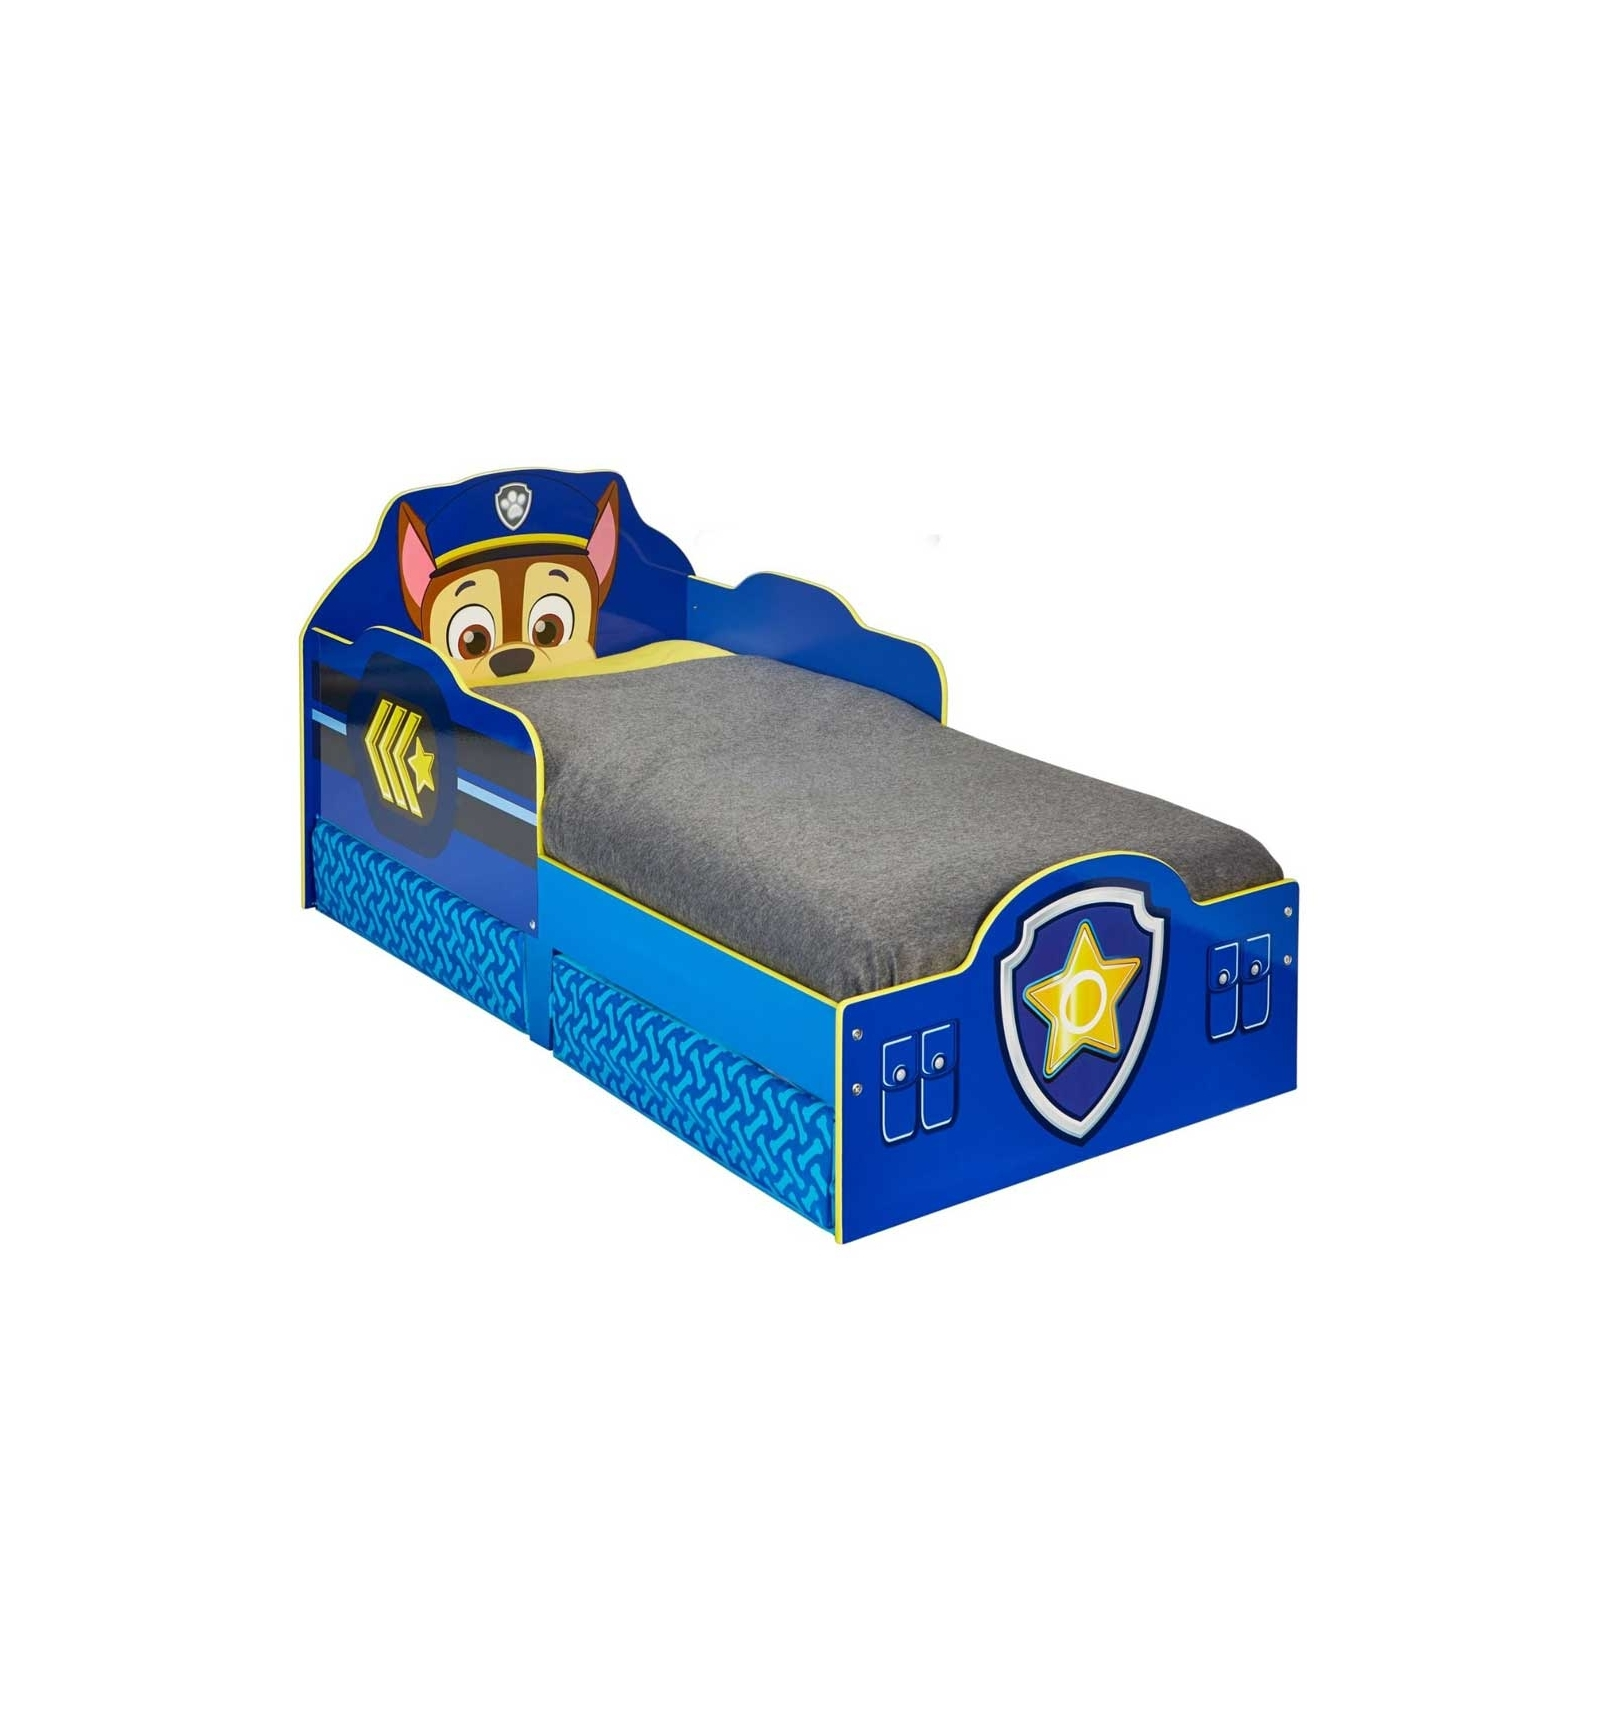 Cama para ni os patrulla canina - Sofas cama infantiles ...